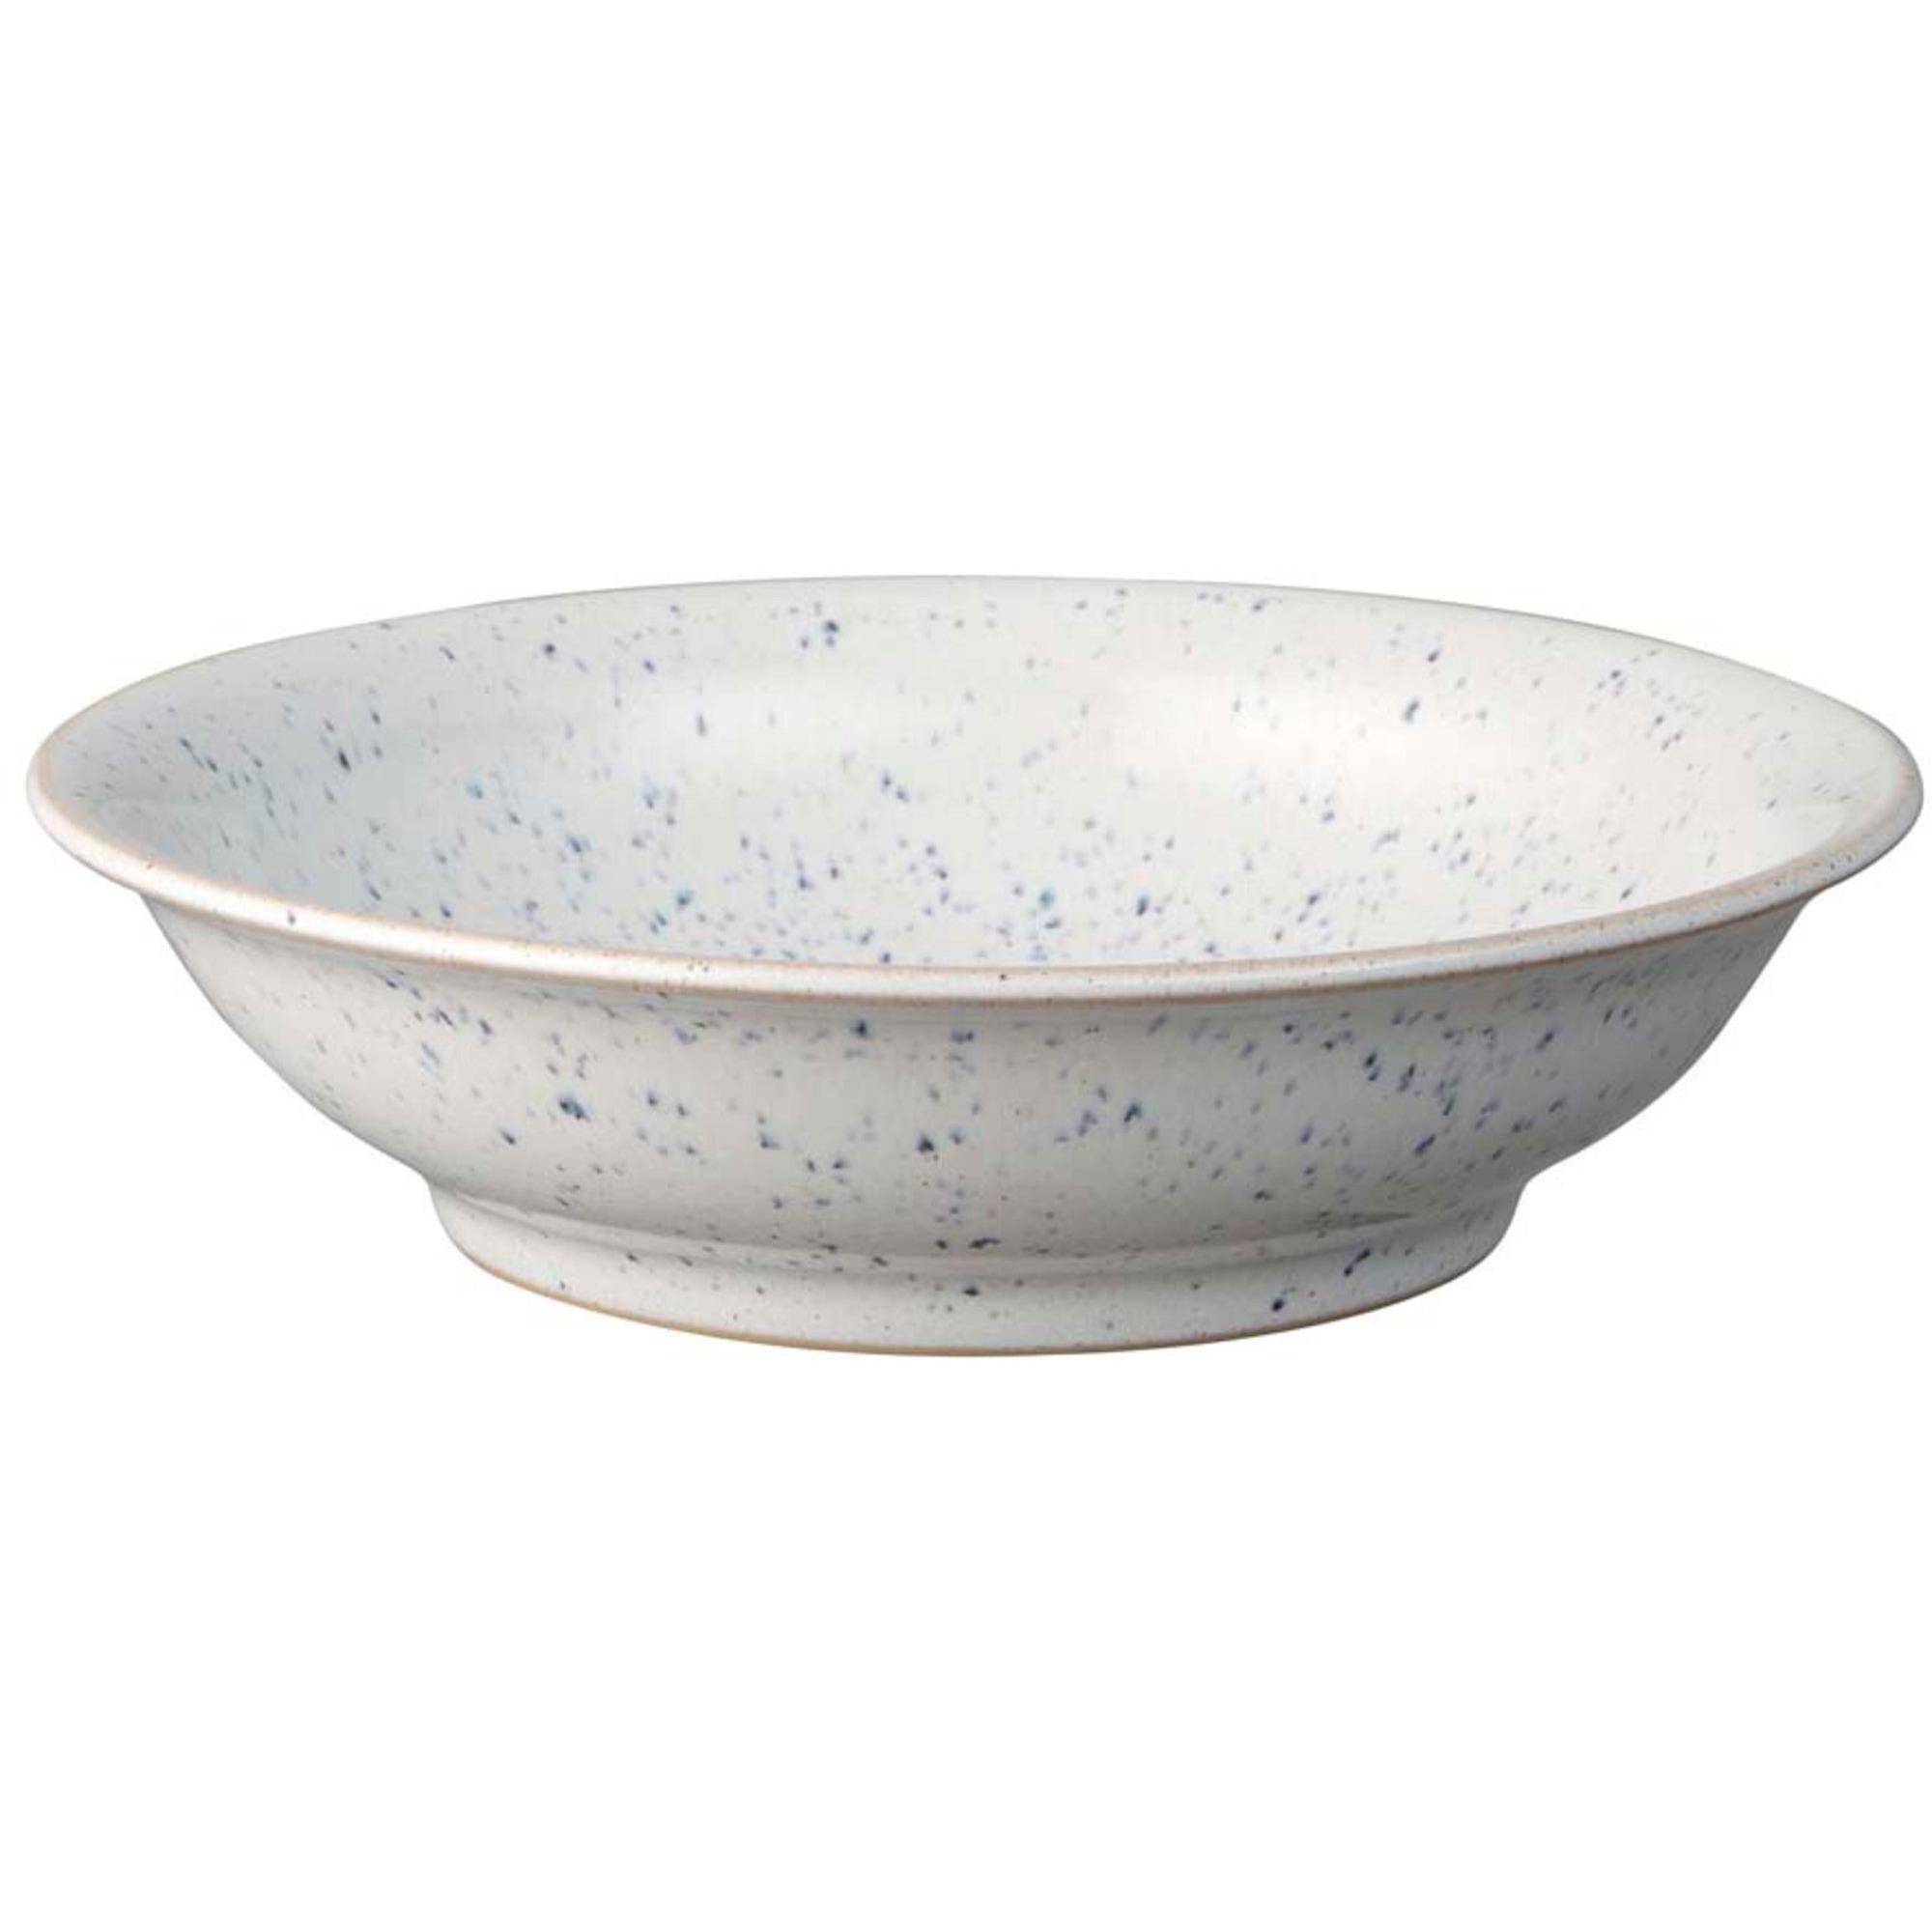 Denby Studio Blue Chalk Medium Shallow Bowl 155cm